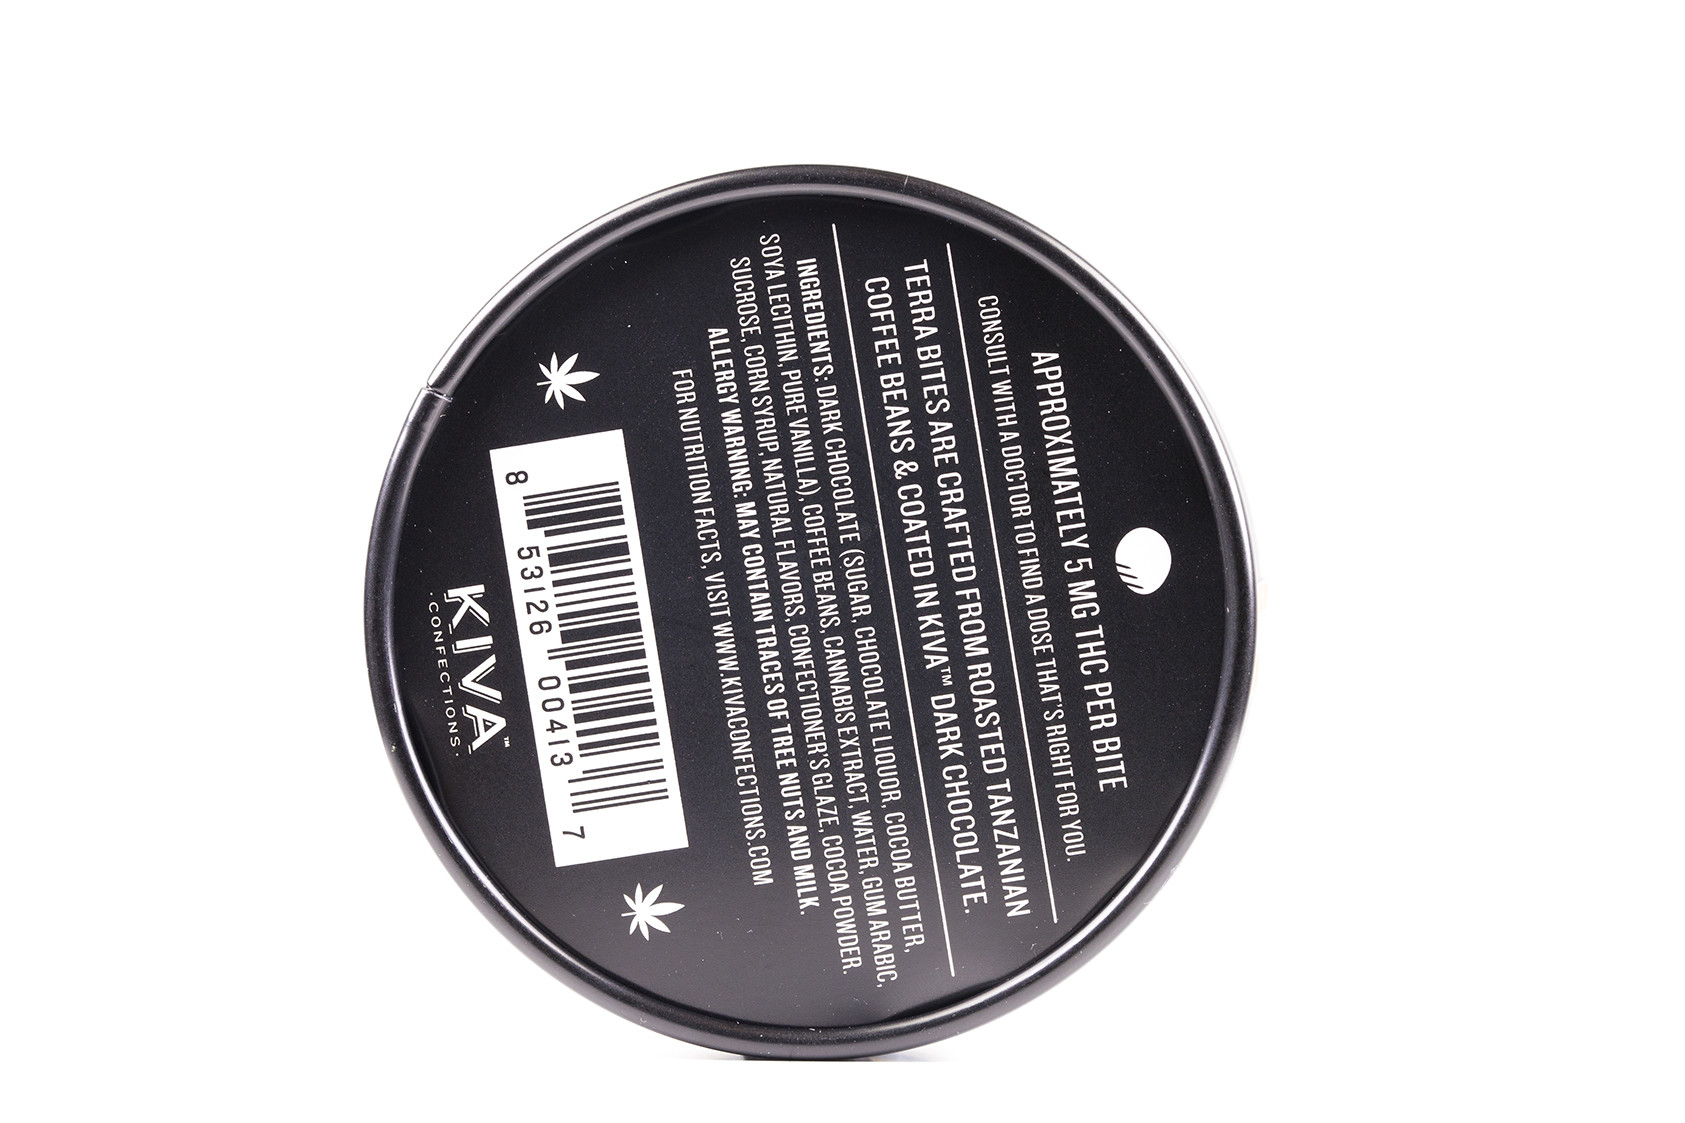 Kiva Espresso Terra Bites - Goods | MERRY JANE